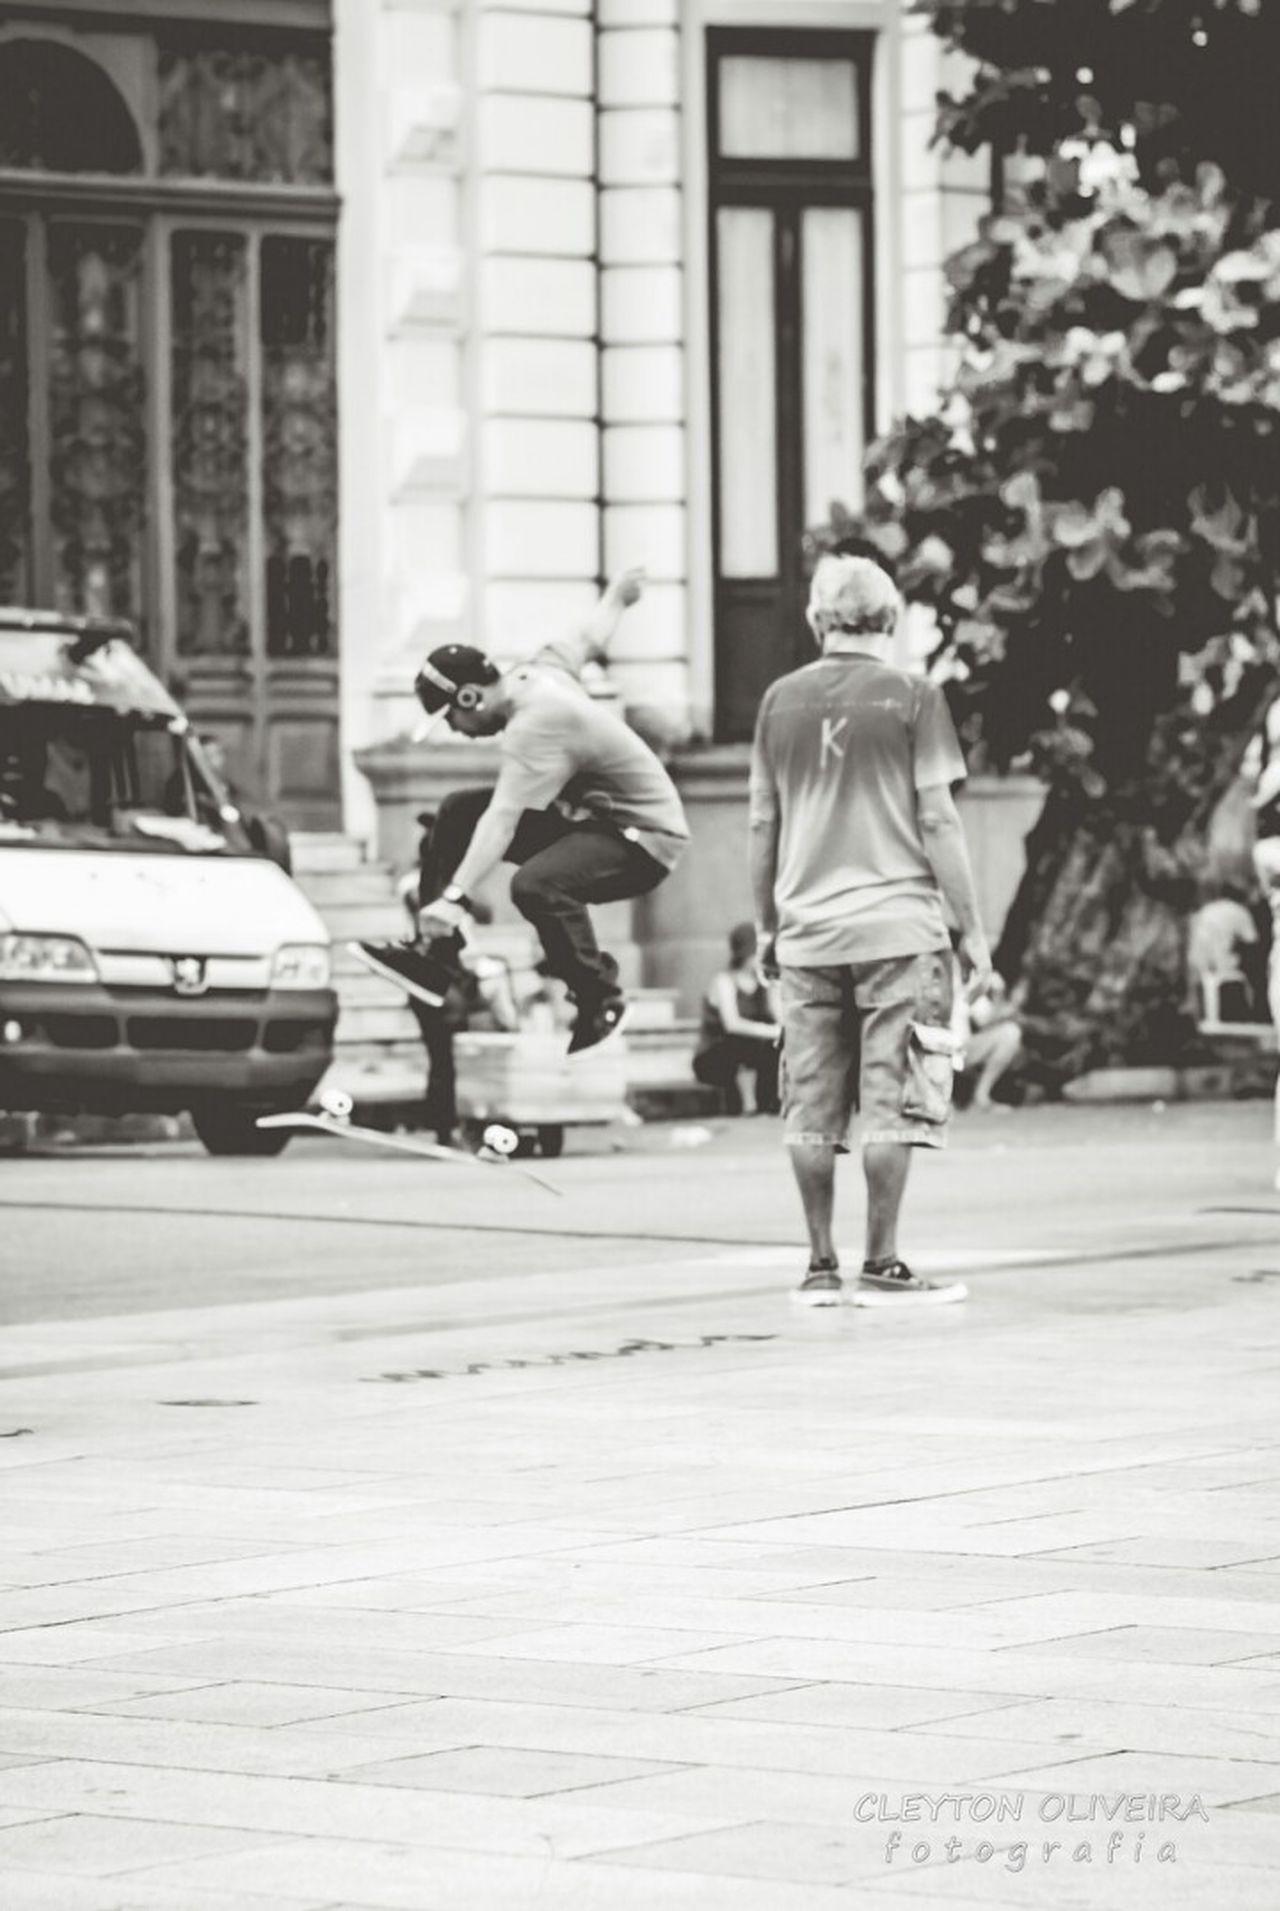 Fotografia De Rua Blackandwhite Photography Urbanphotography Preto & Branco Black And White Photography Pretoebranco Black&white Blackandwhite Streetphotography Black & White RecifeAntigo Recife, BRASIL City Street Streetphoto_bw